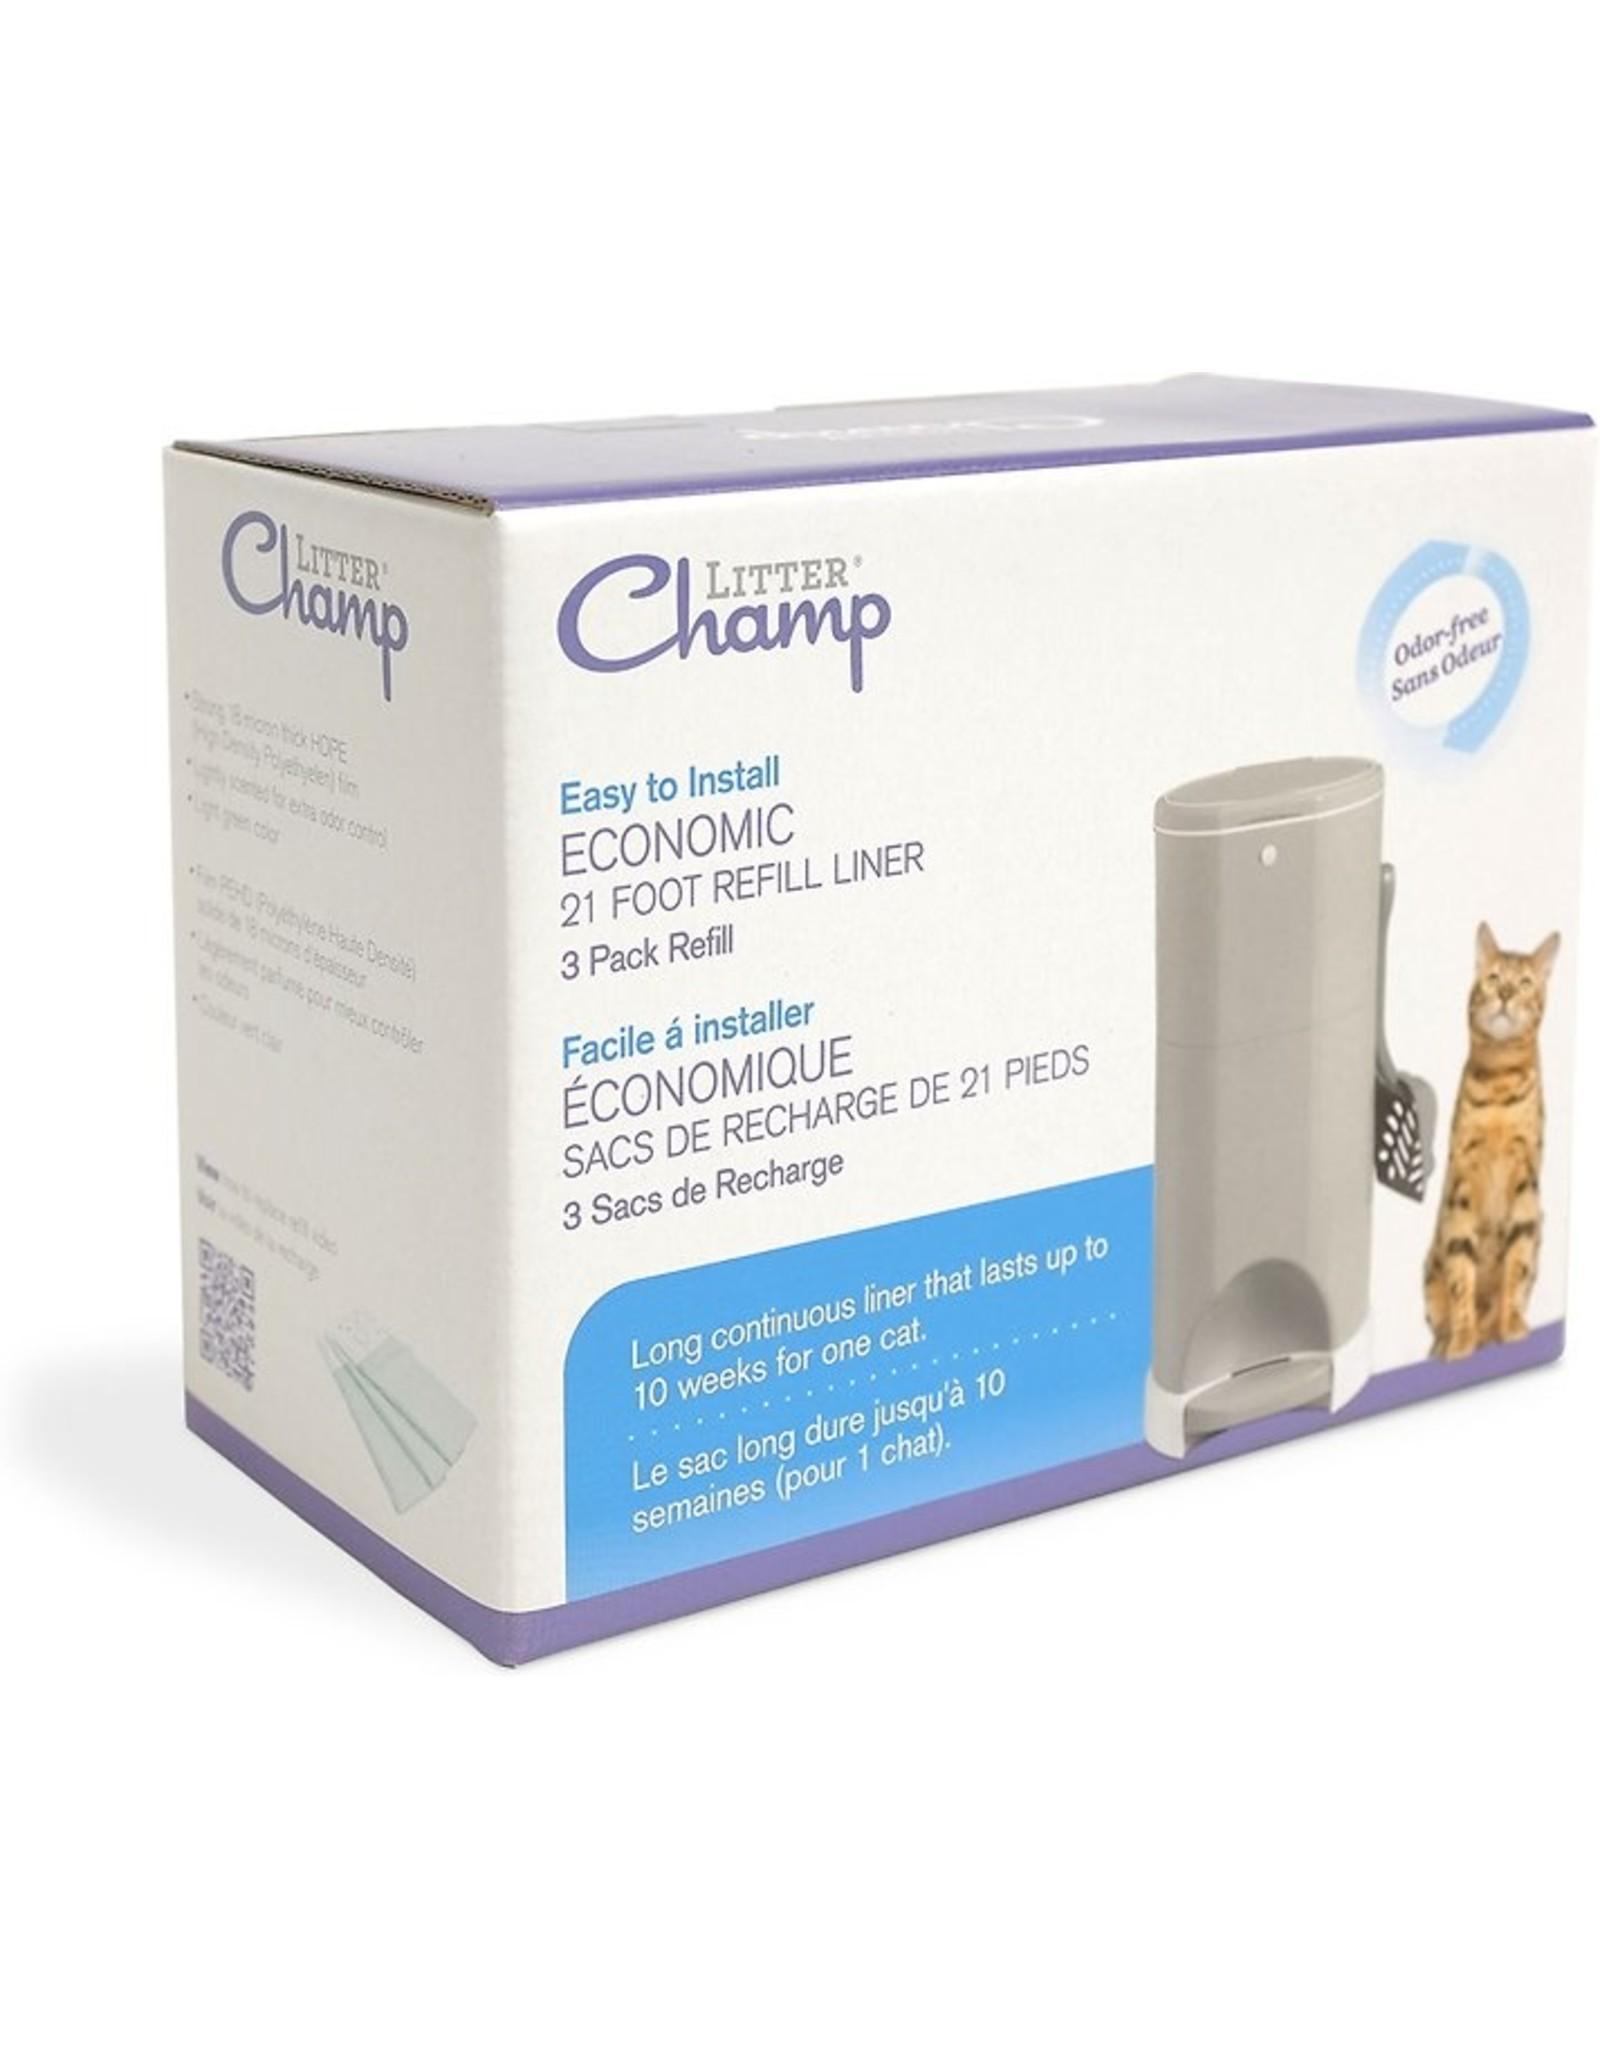 Litter Champ Litter Champ Refill Liners 1pk - 3pk